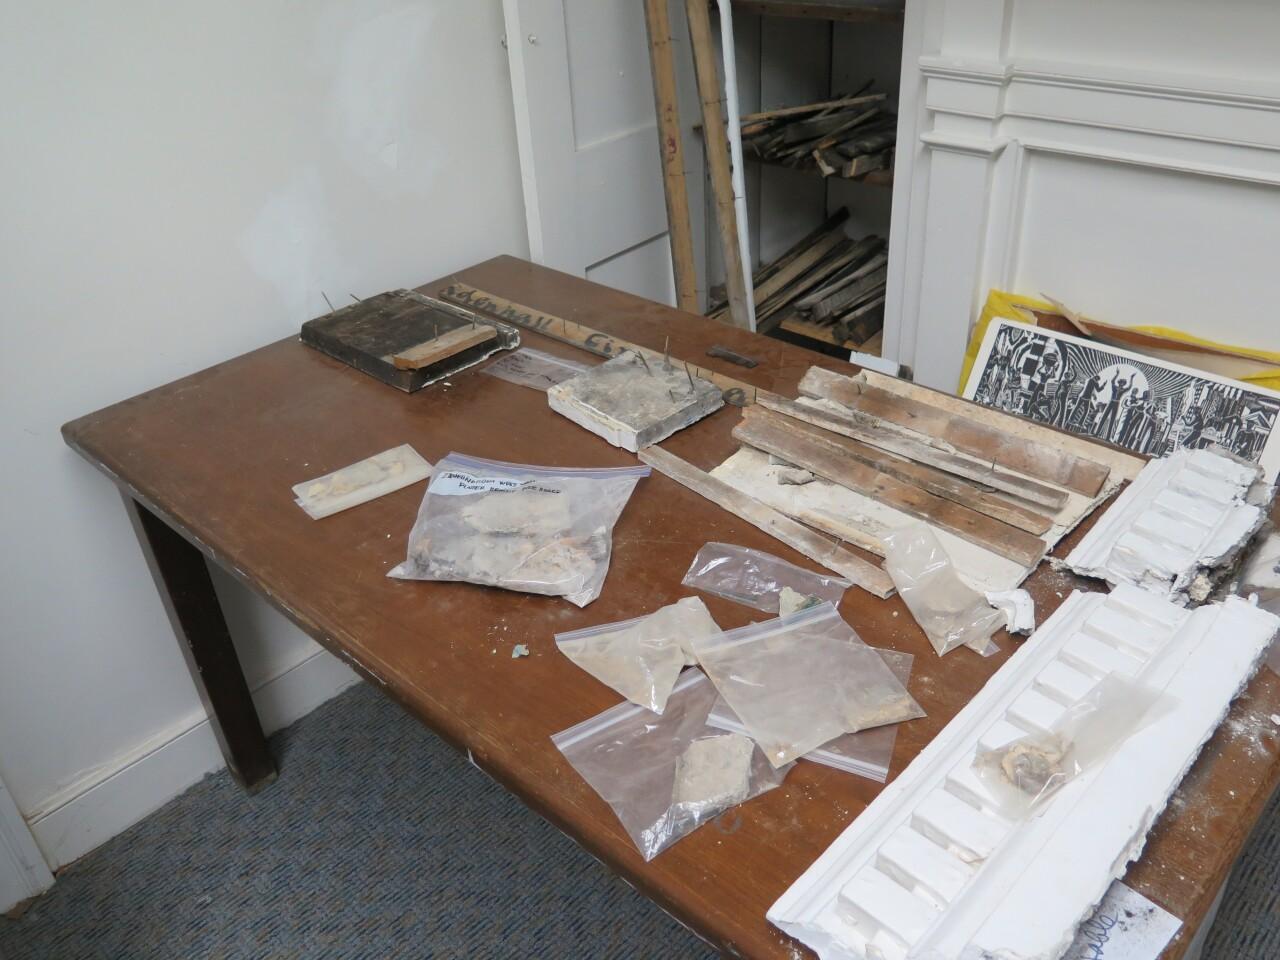 HBSH_archeology_room.JPG